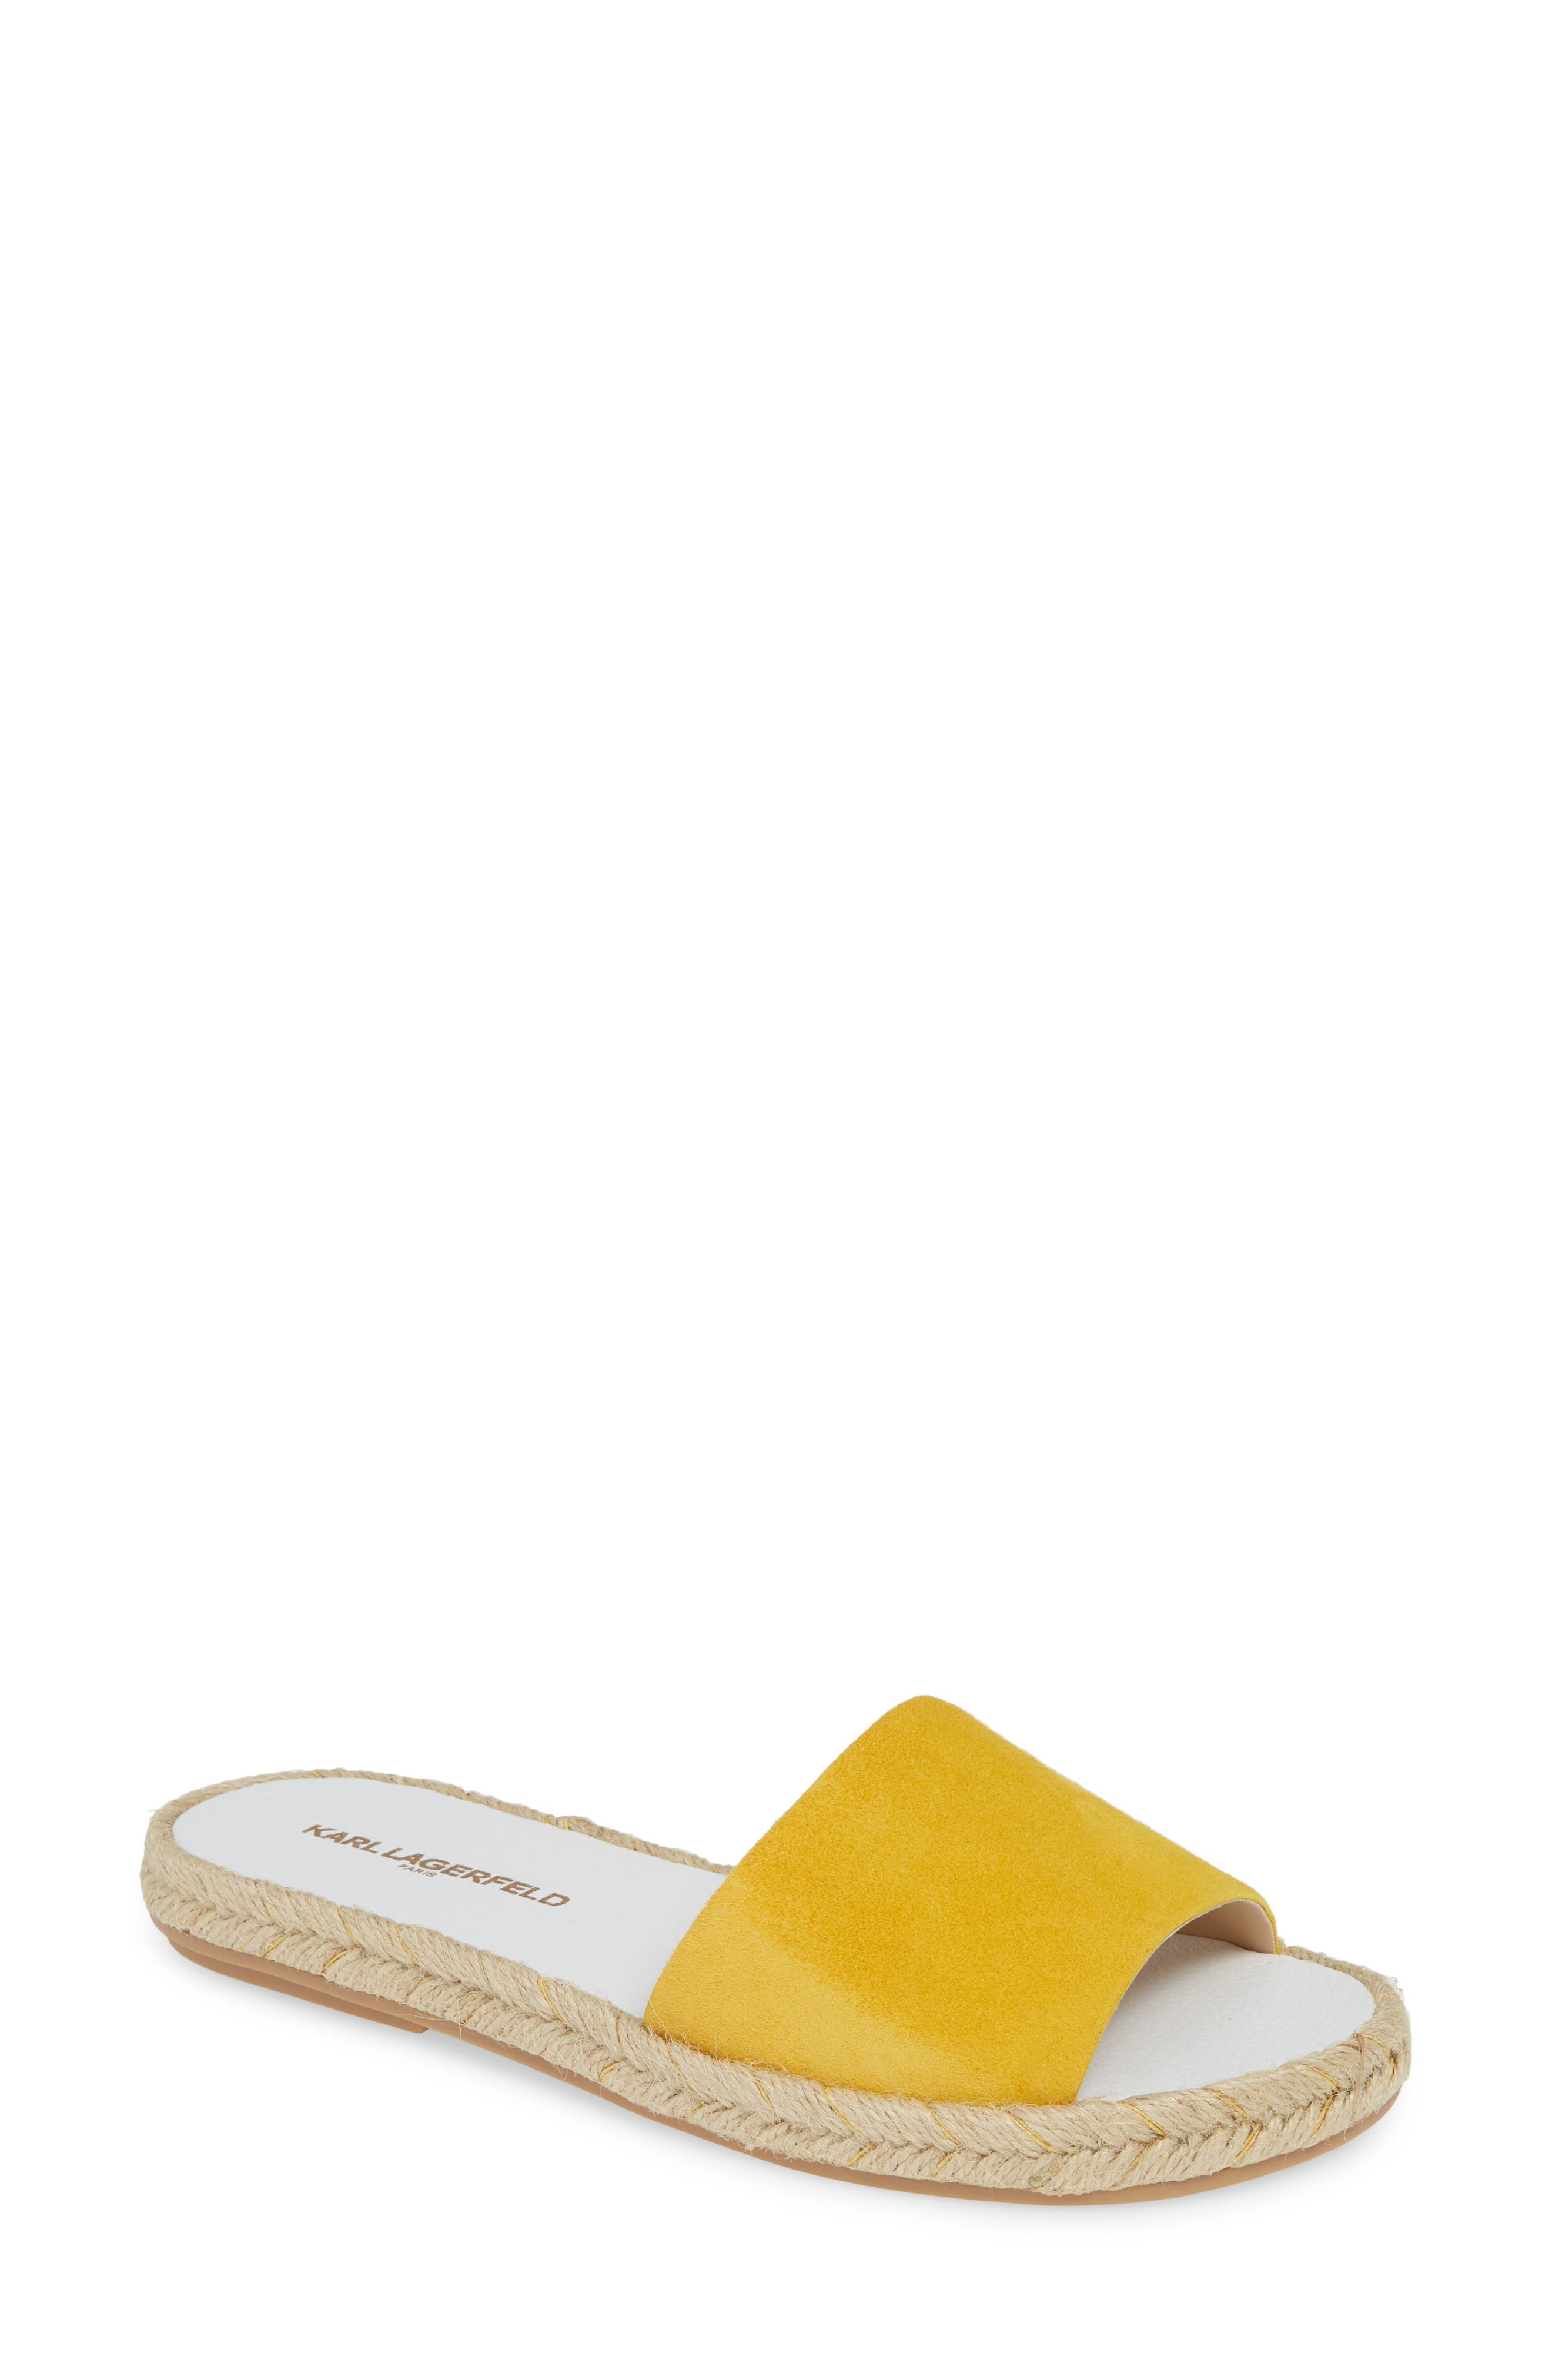 Karl Lagerfeld Paris Niya Slide Sandal, Yellow